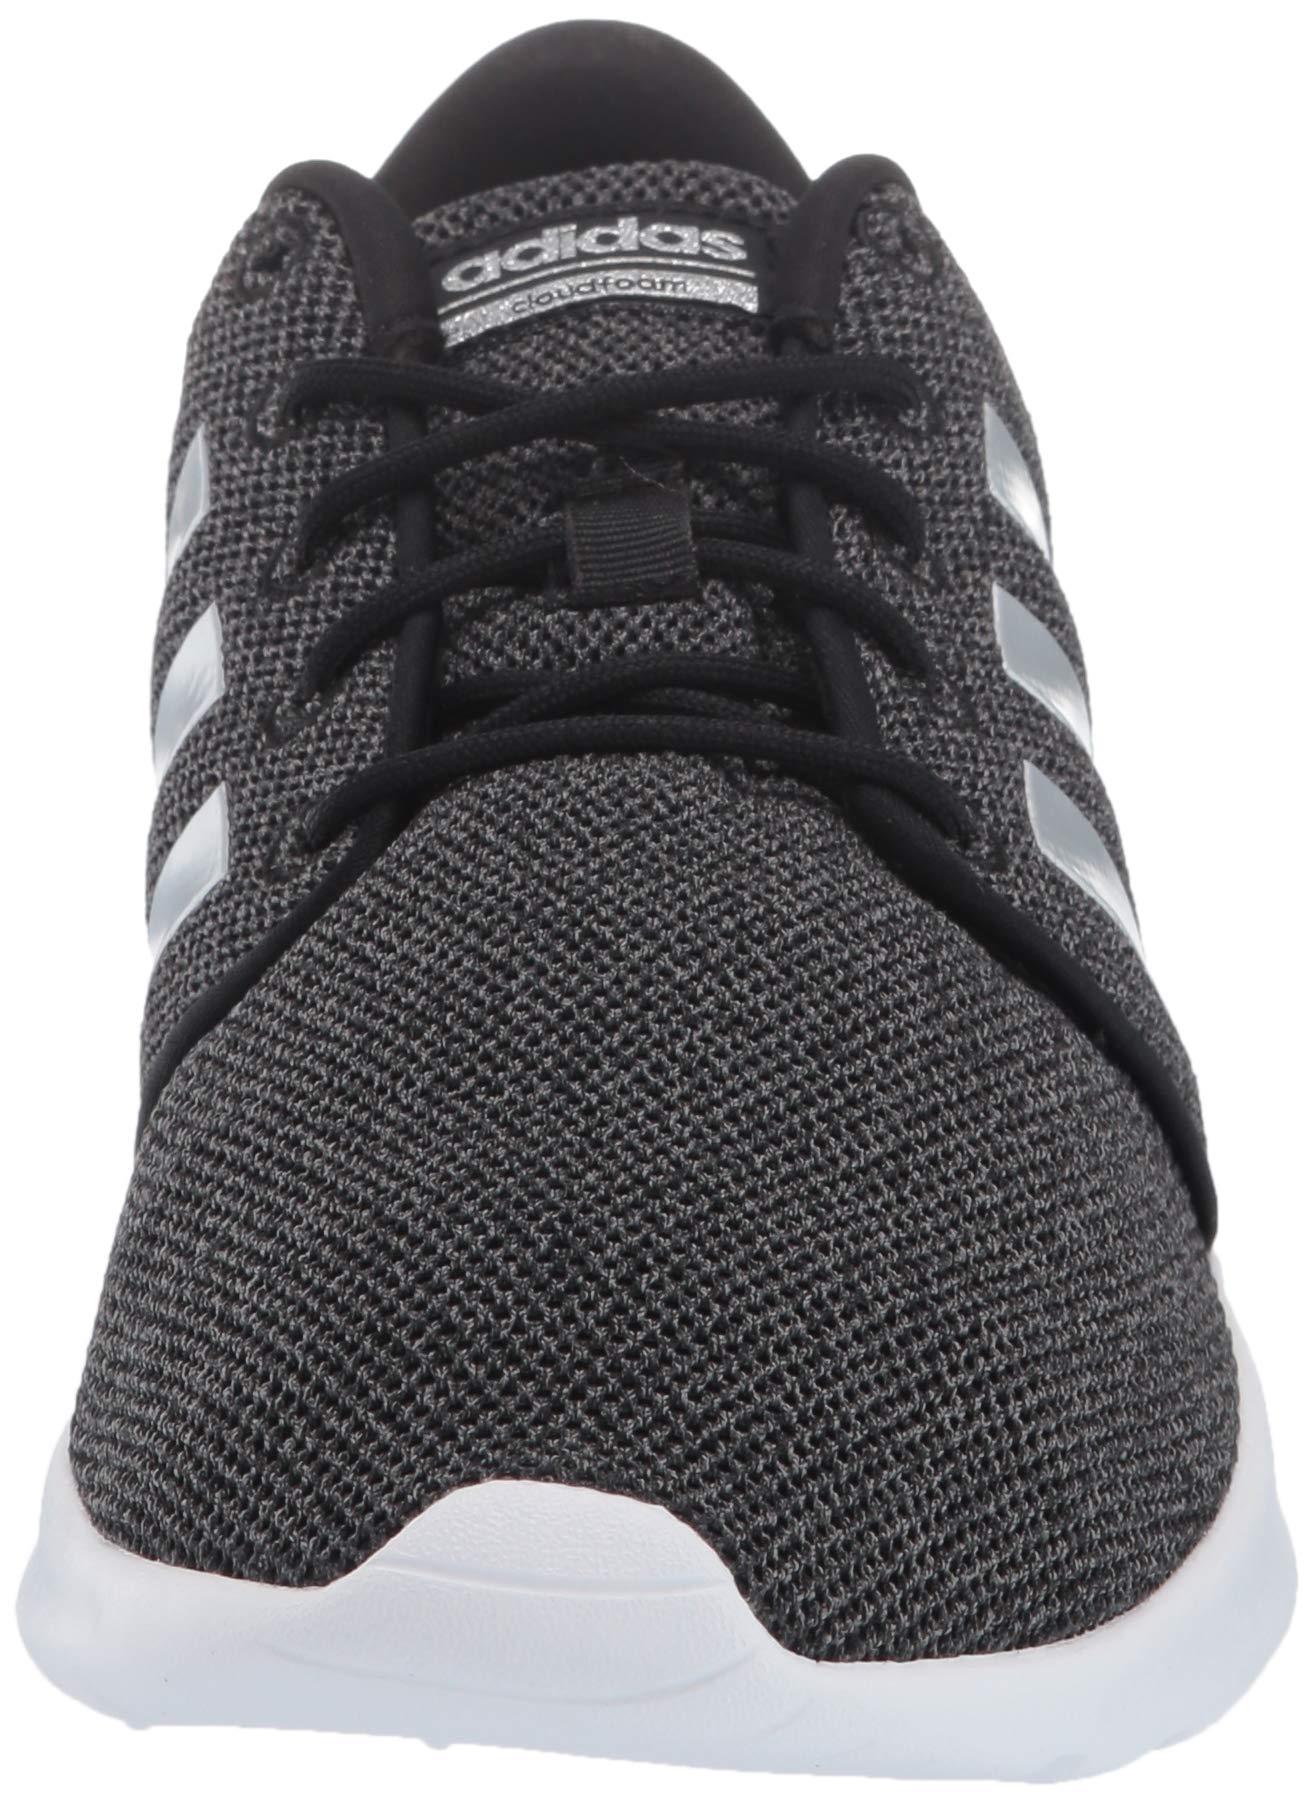 adidas Women's Cloudfoam Qt Racer Sneaker, Black/Silver Metallic/Grey, 5.5 M US by adidas (Image #4)